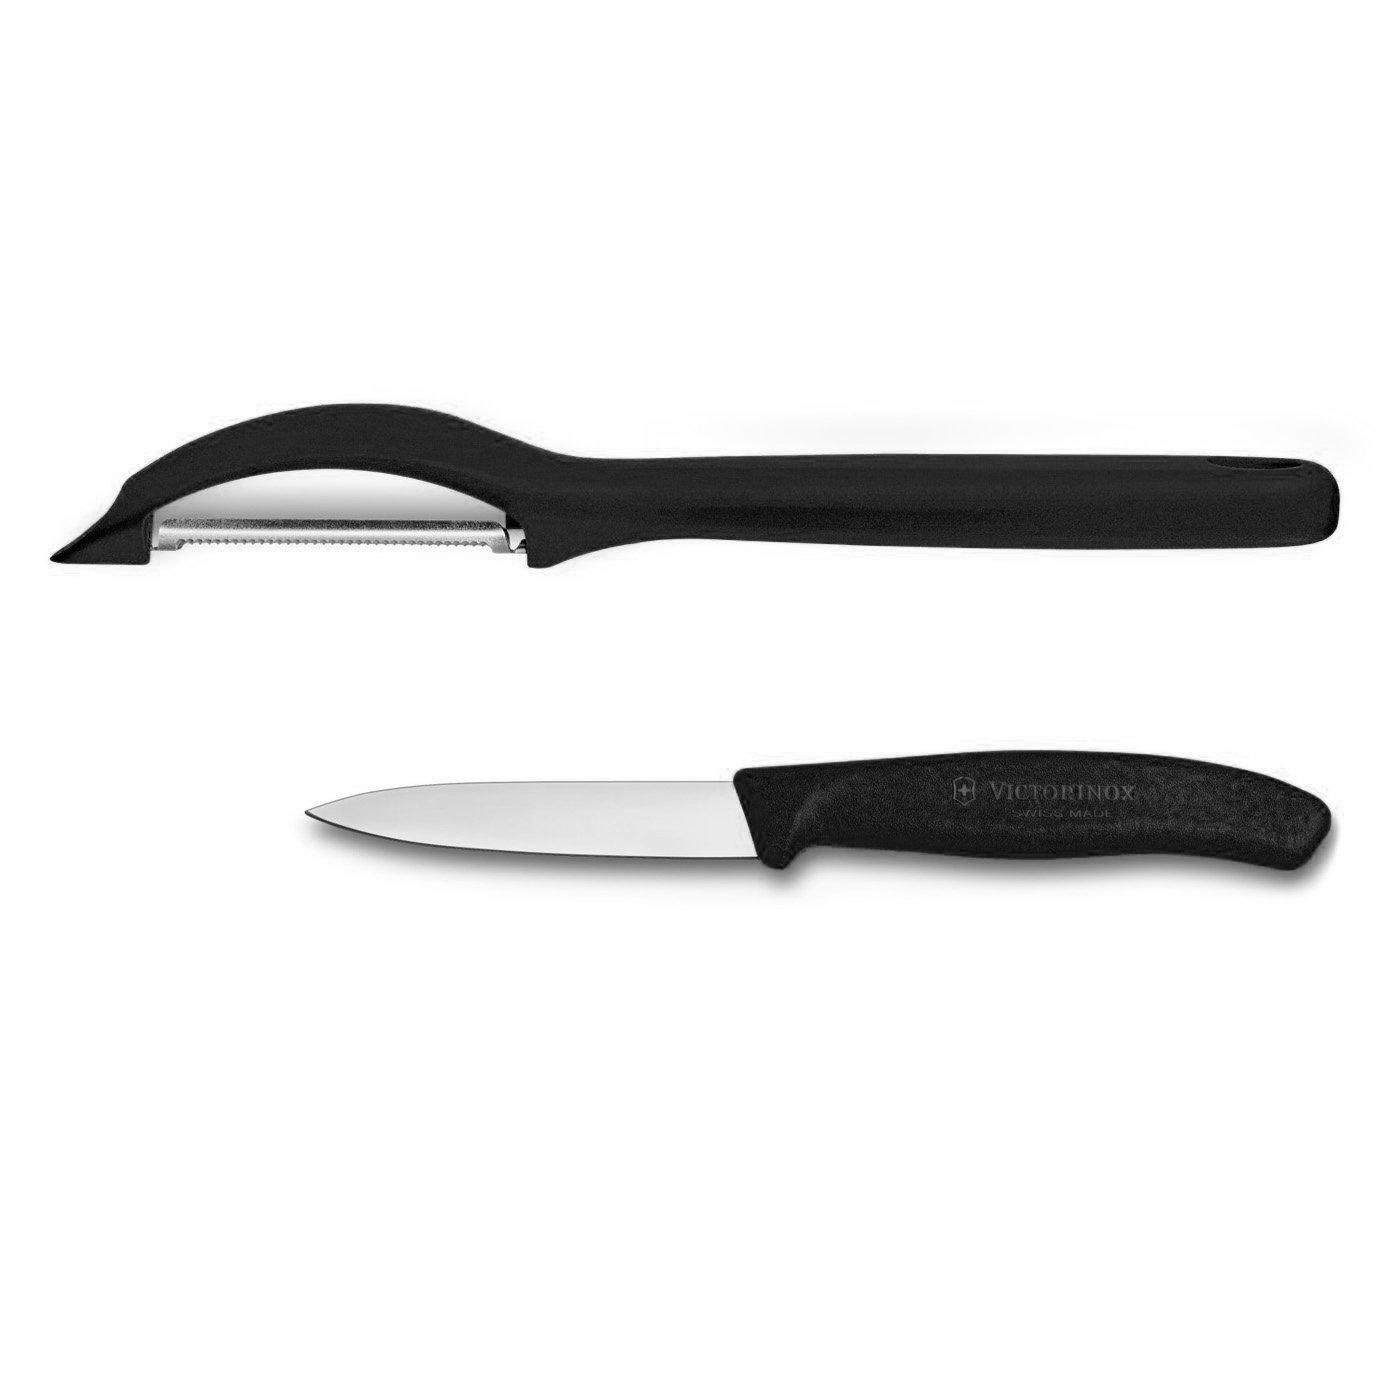 Victorinox Swiss 2 Piece Stainless Steel Paring Knife and Peeler Set with Black Fibrox Handles bestlead chinese peony pattern zirconia ceramics 4 6 knife chopping knife peeler holder